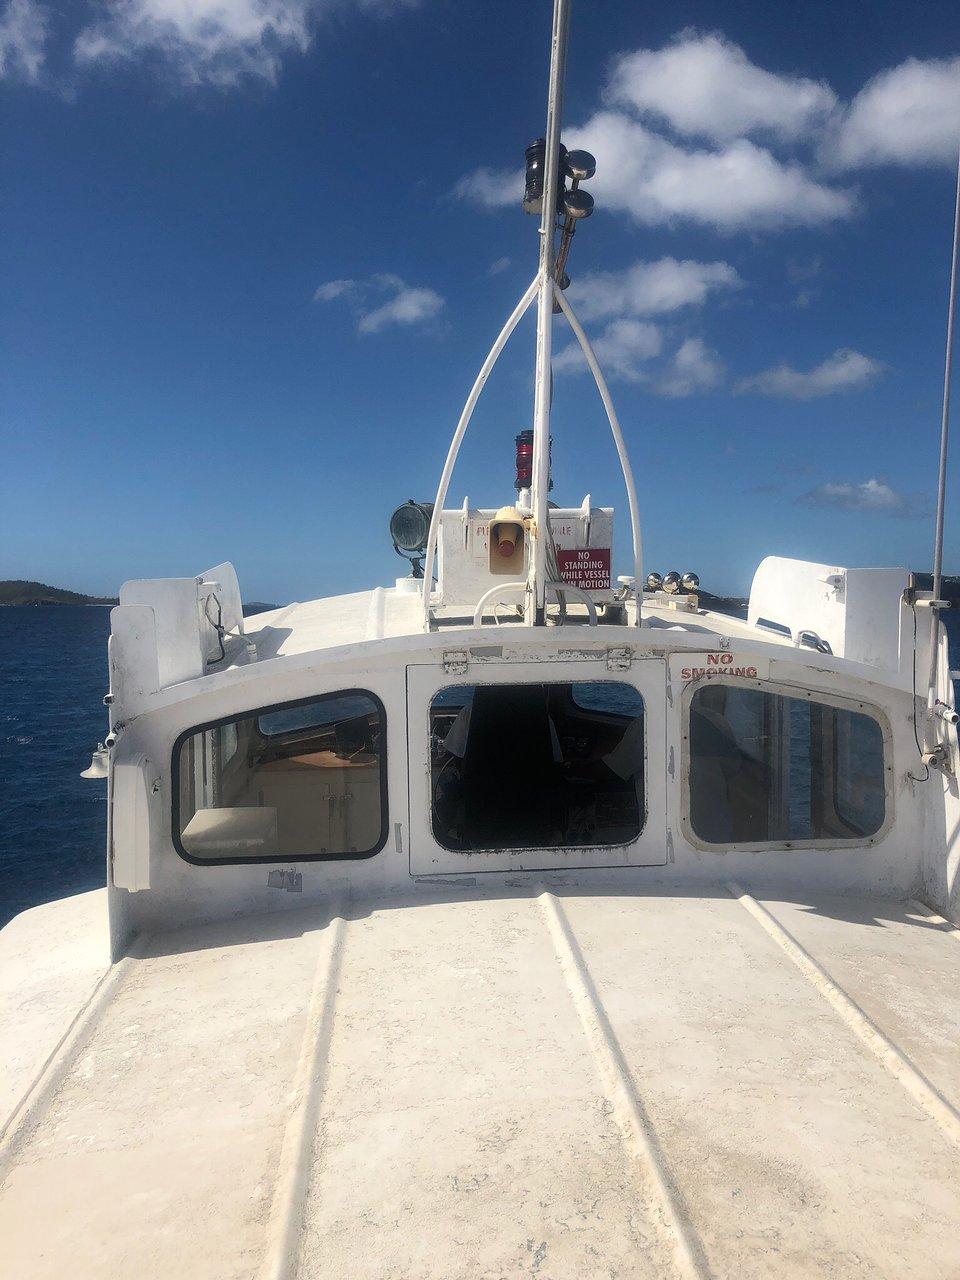 inter island boat service cruz bay 2019 all you need. Black Bedroom Furniture Sets. Home Design Ideas